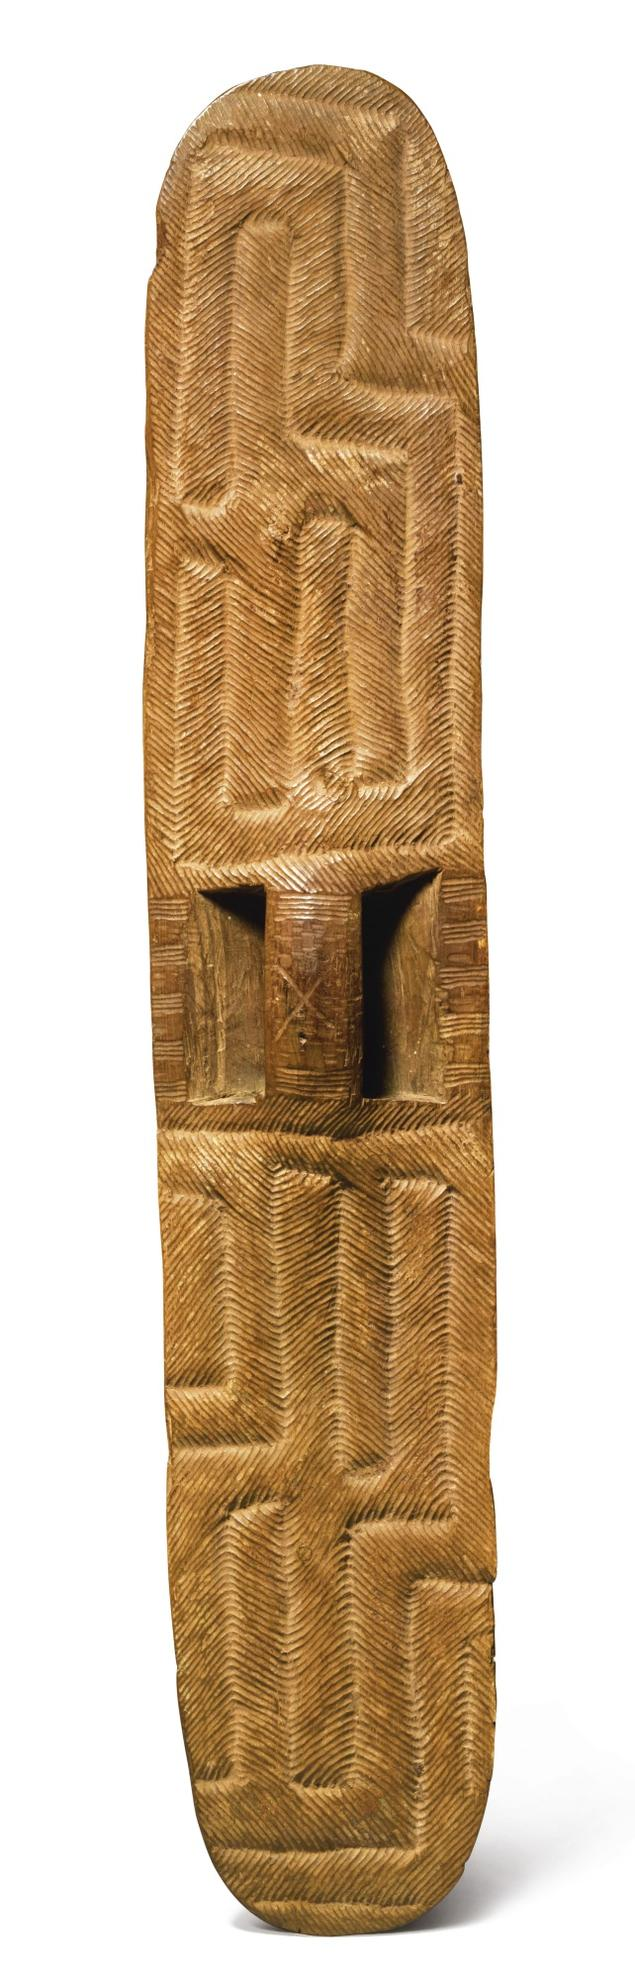 Karajarri Artist Kimberley Western Australia - Shield (Karrbinna)-